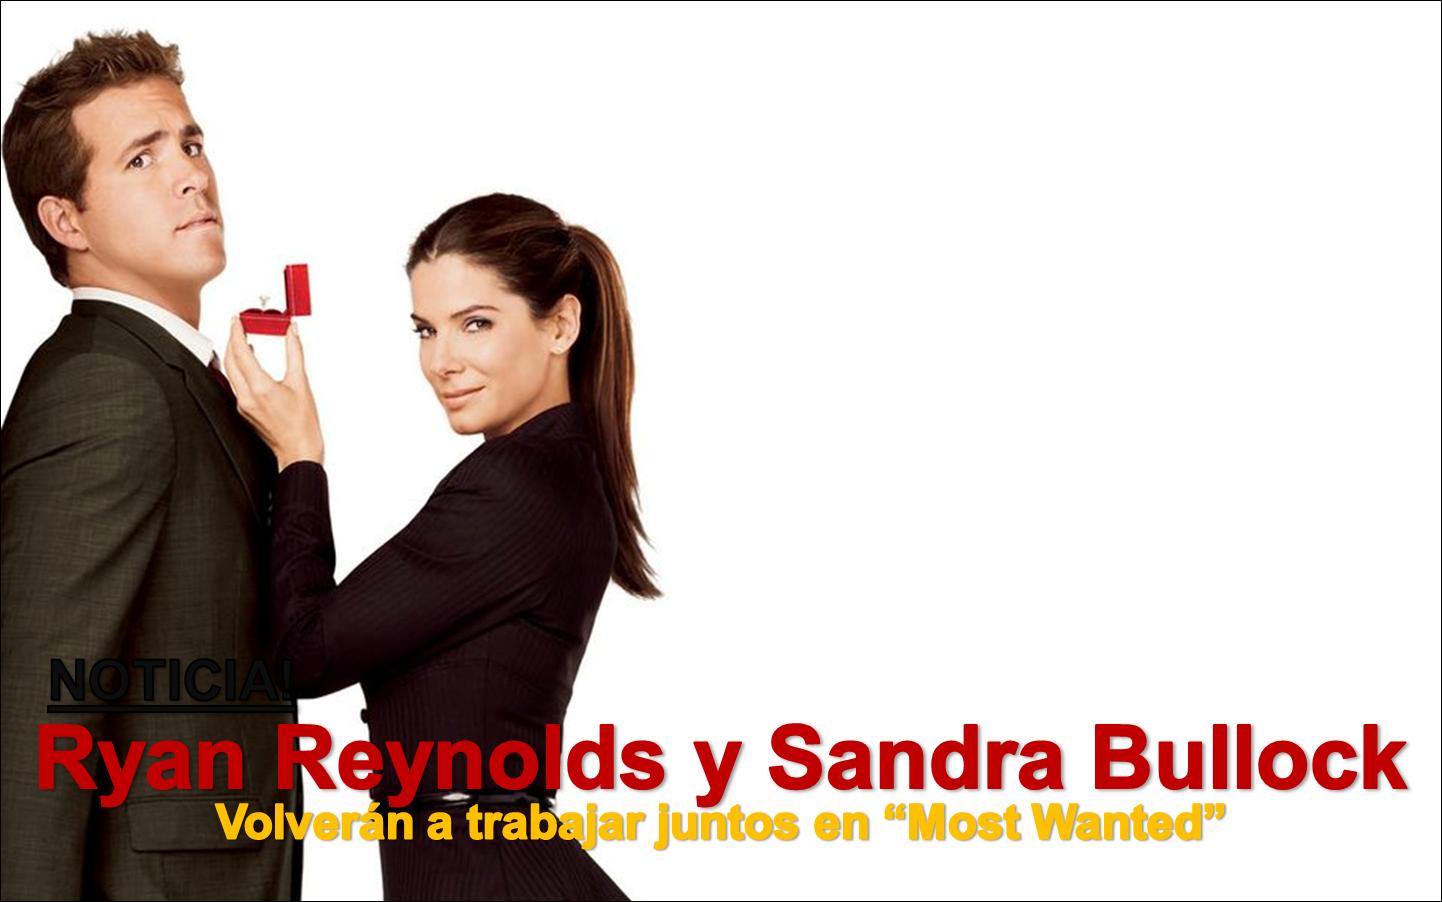 http://4.bp.blogspot.com/_dbXAbF1CTso/TA_ATFrC4WI/AAAAAAAAANU/df5XZPWKHxc/s1600/Ryan+Reynolds+y+Sandra+Bullock.png